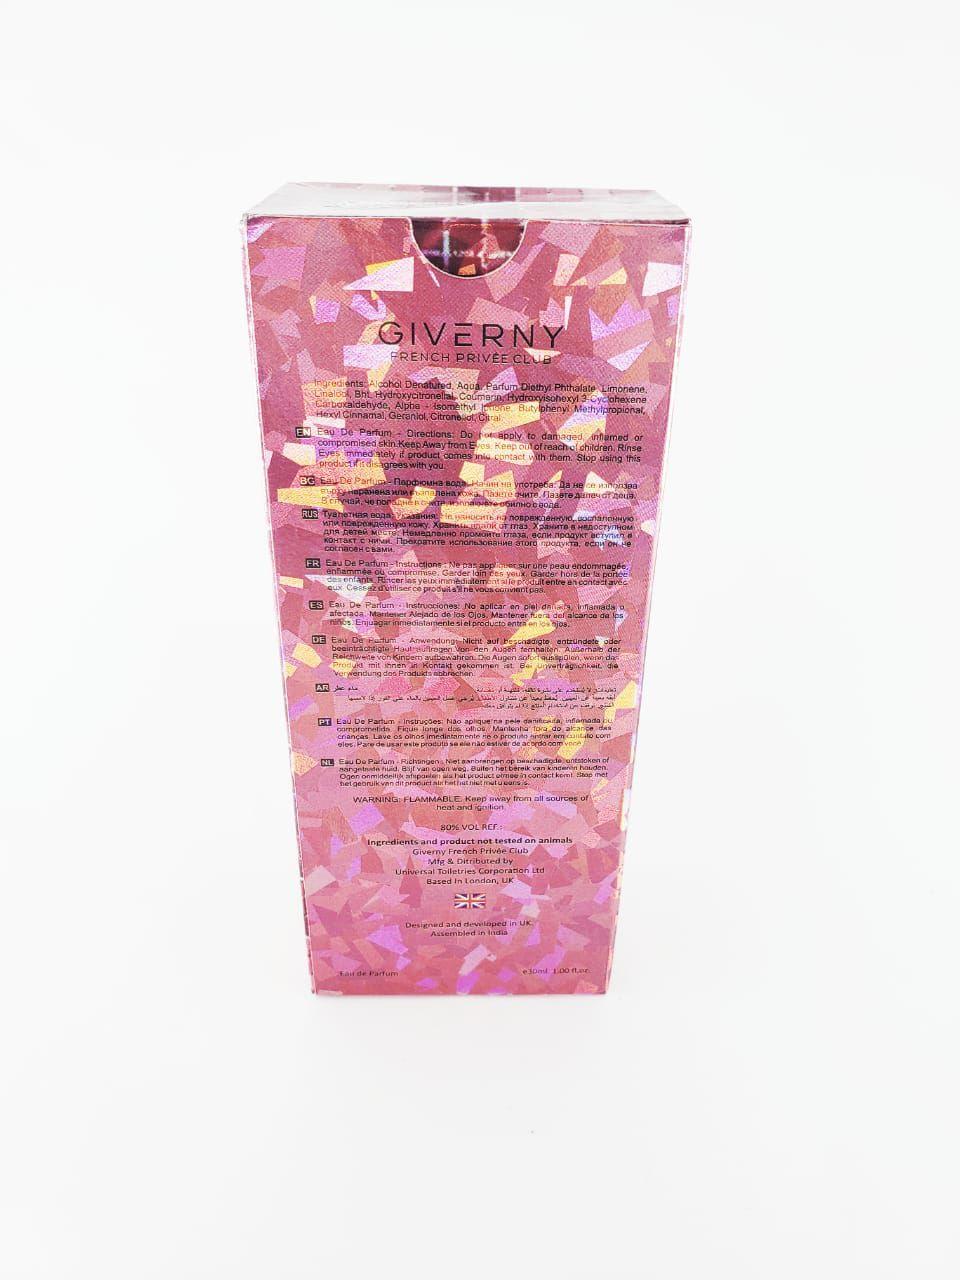 Perfume Giverny elegance feminino 30 ml